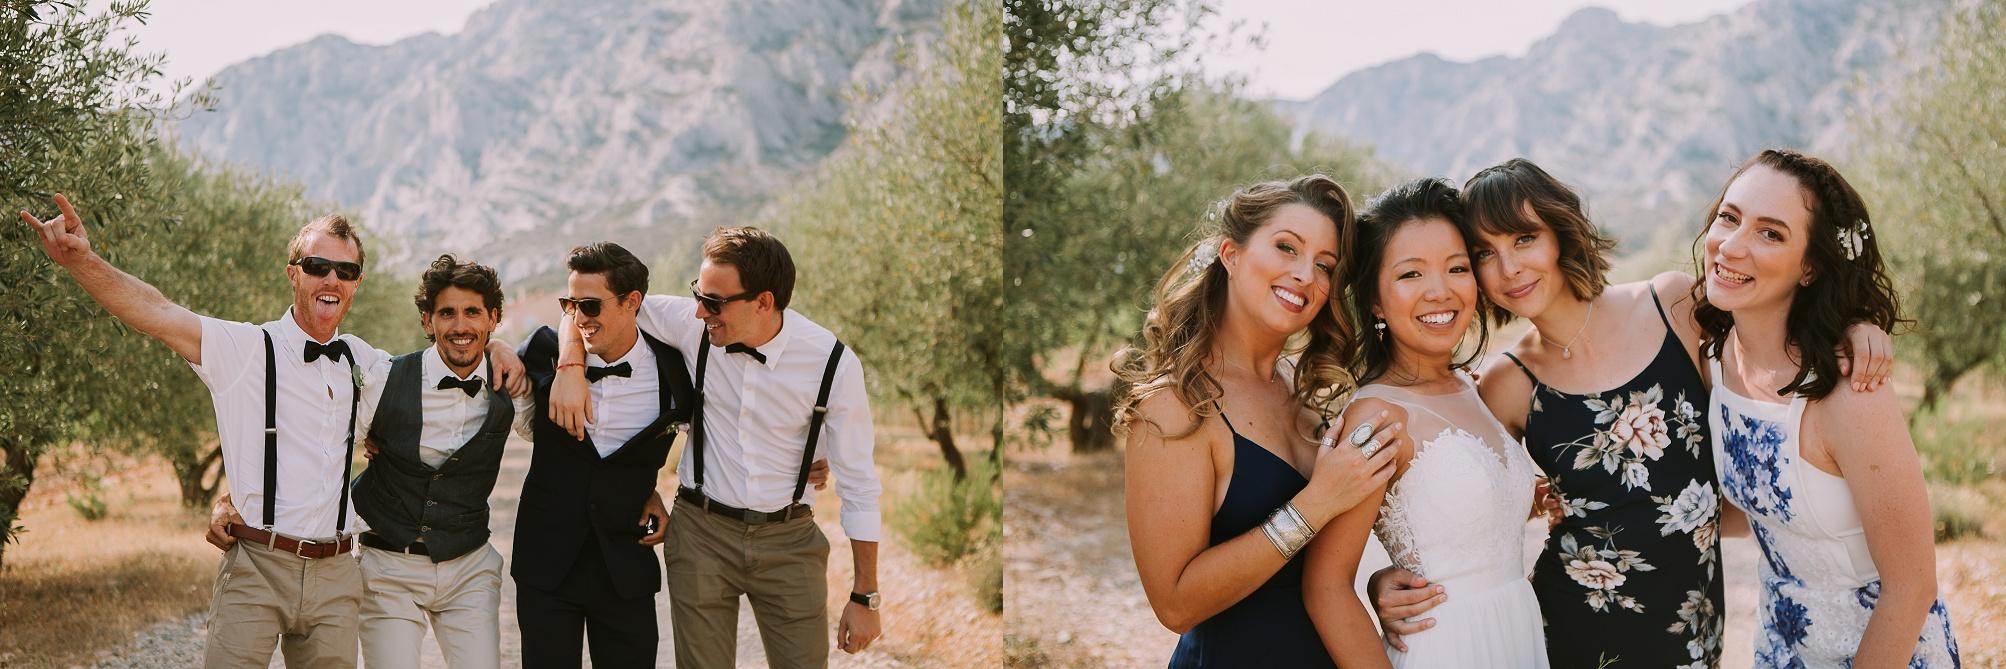 katerynaphotos-mariage-photographe-puyloubier-provence-aix-en-provence-sud-de-la-france_0391.jpg